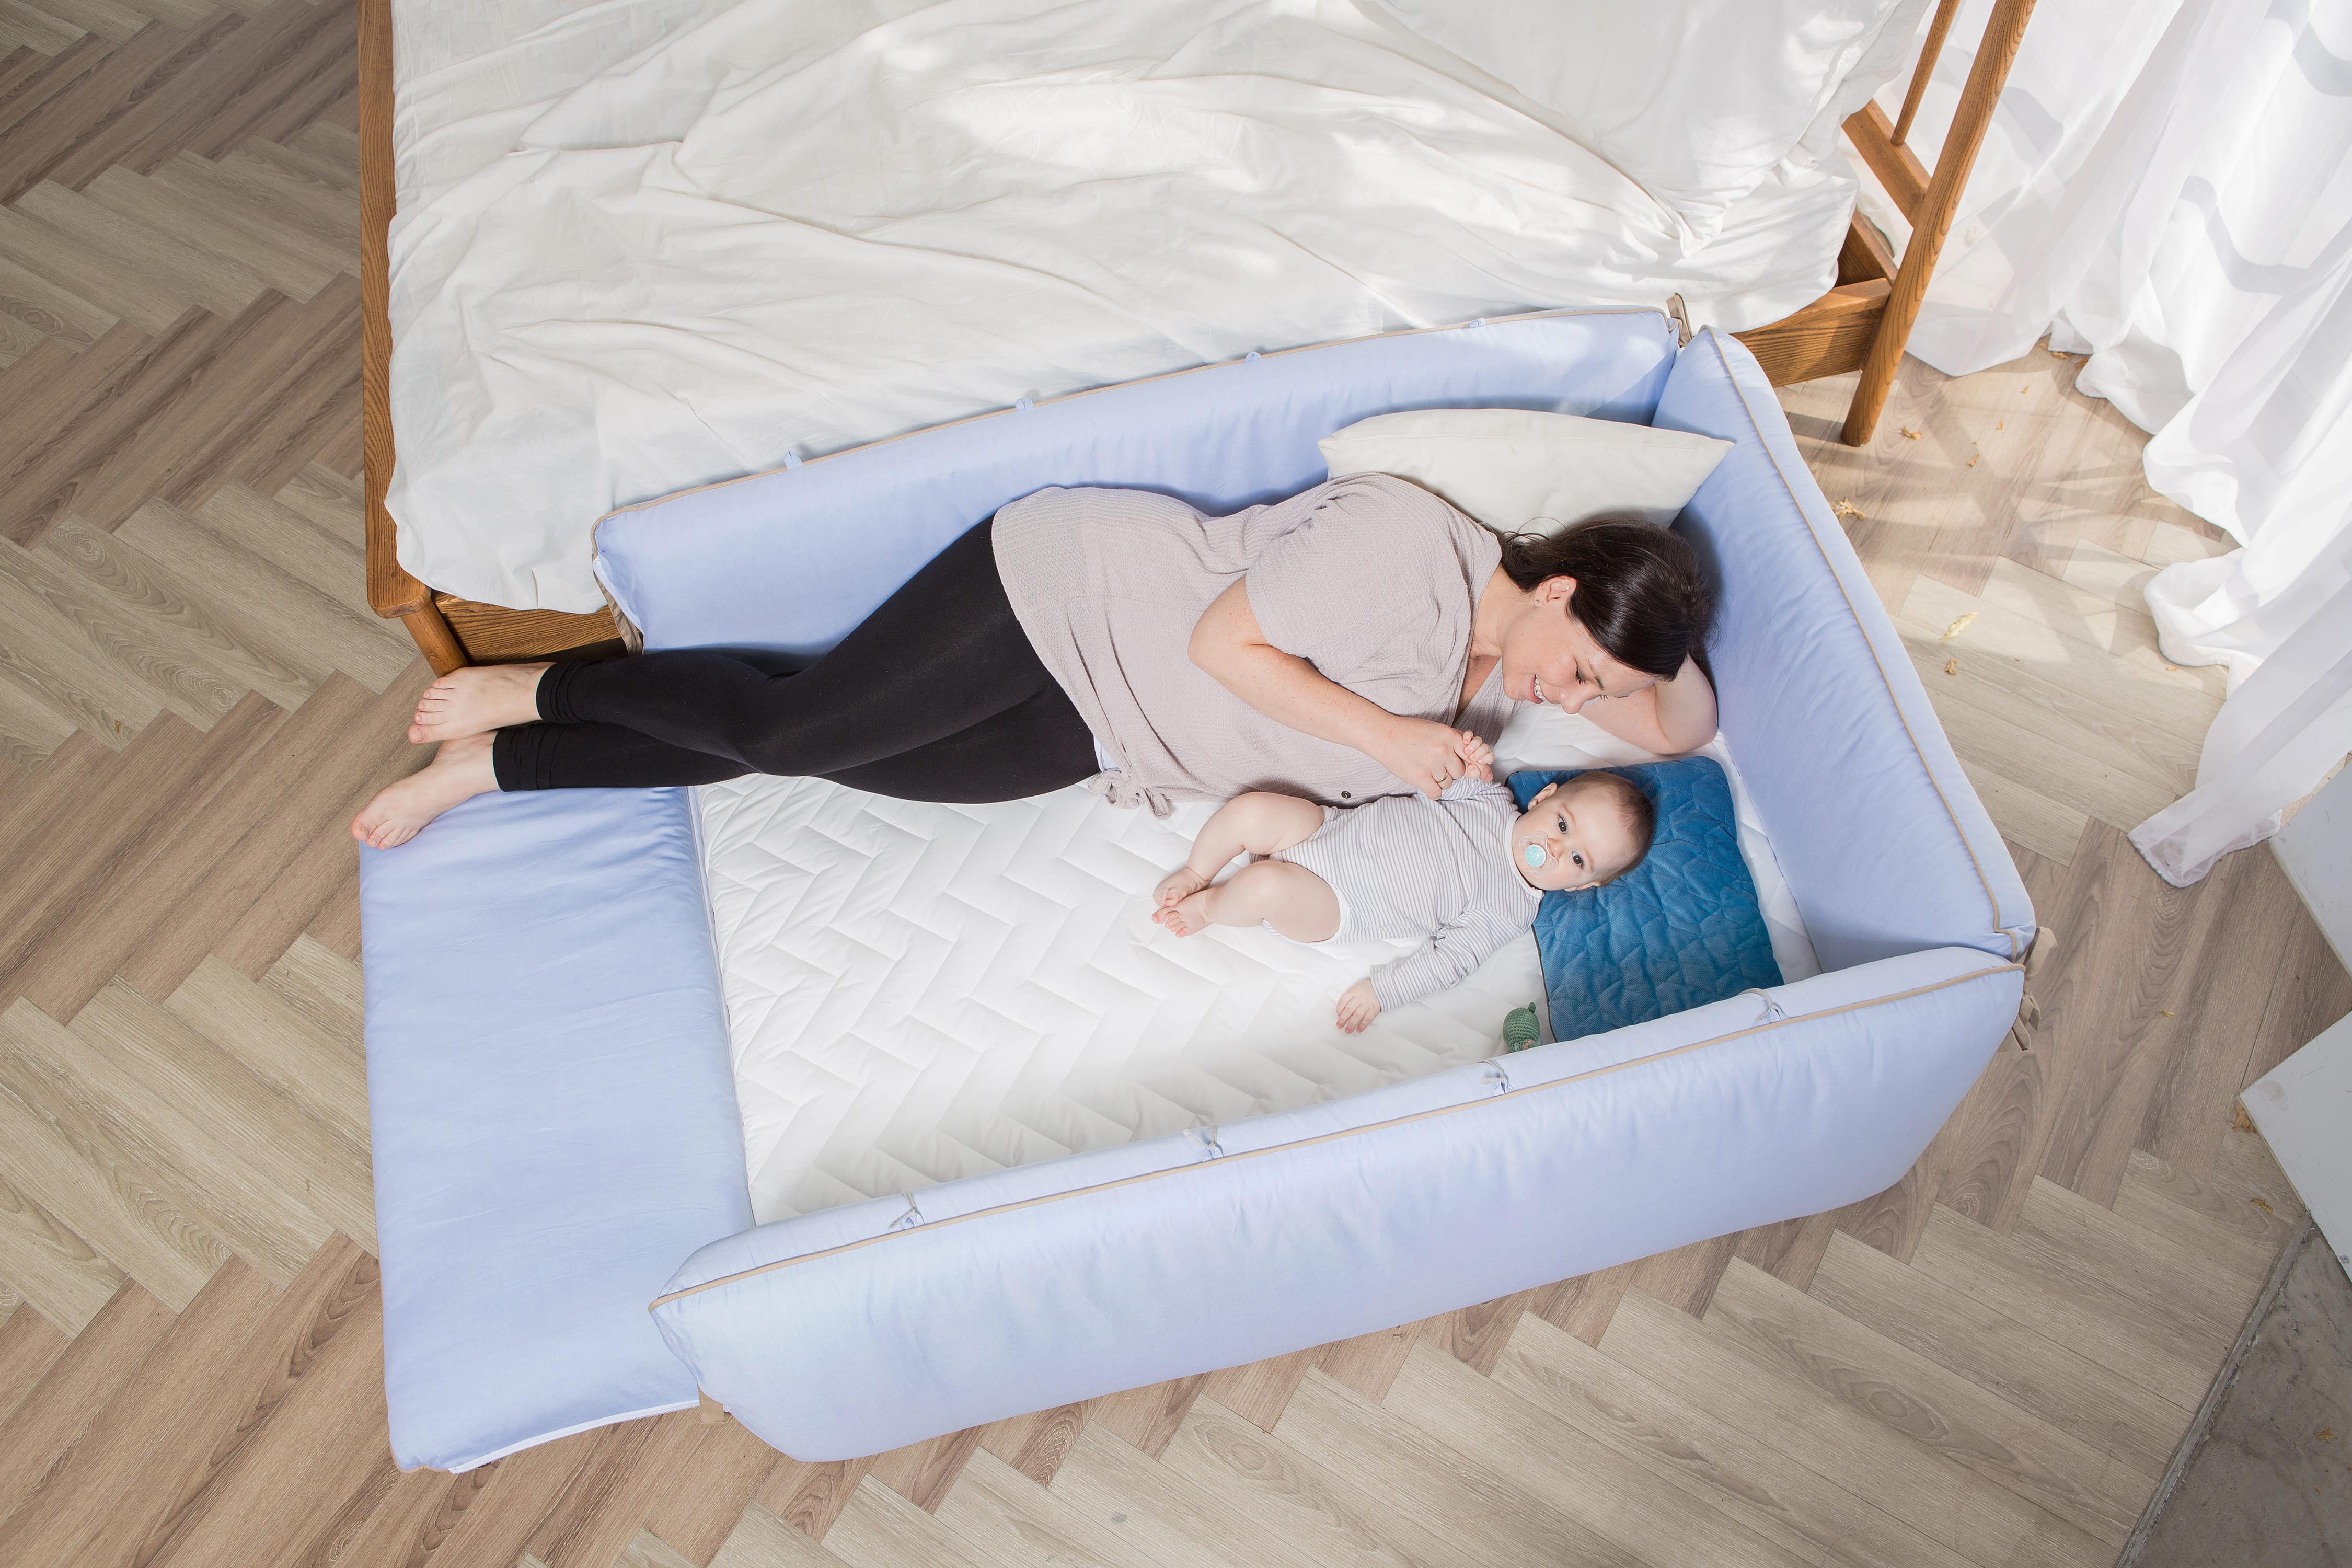 gunite嬰兒床陪睡安全感